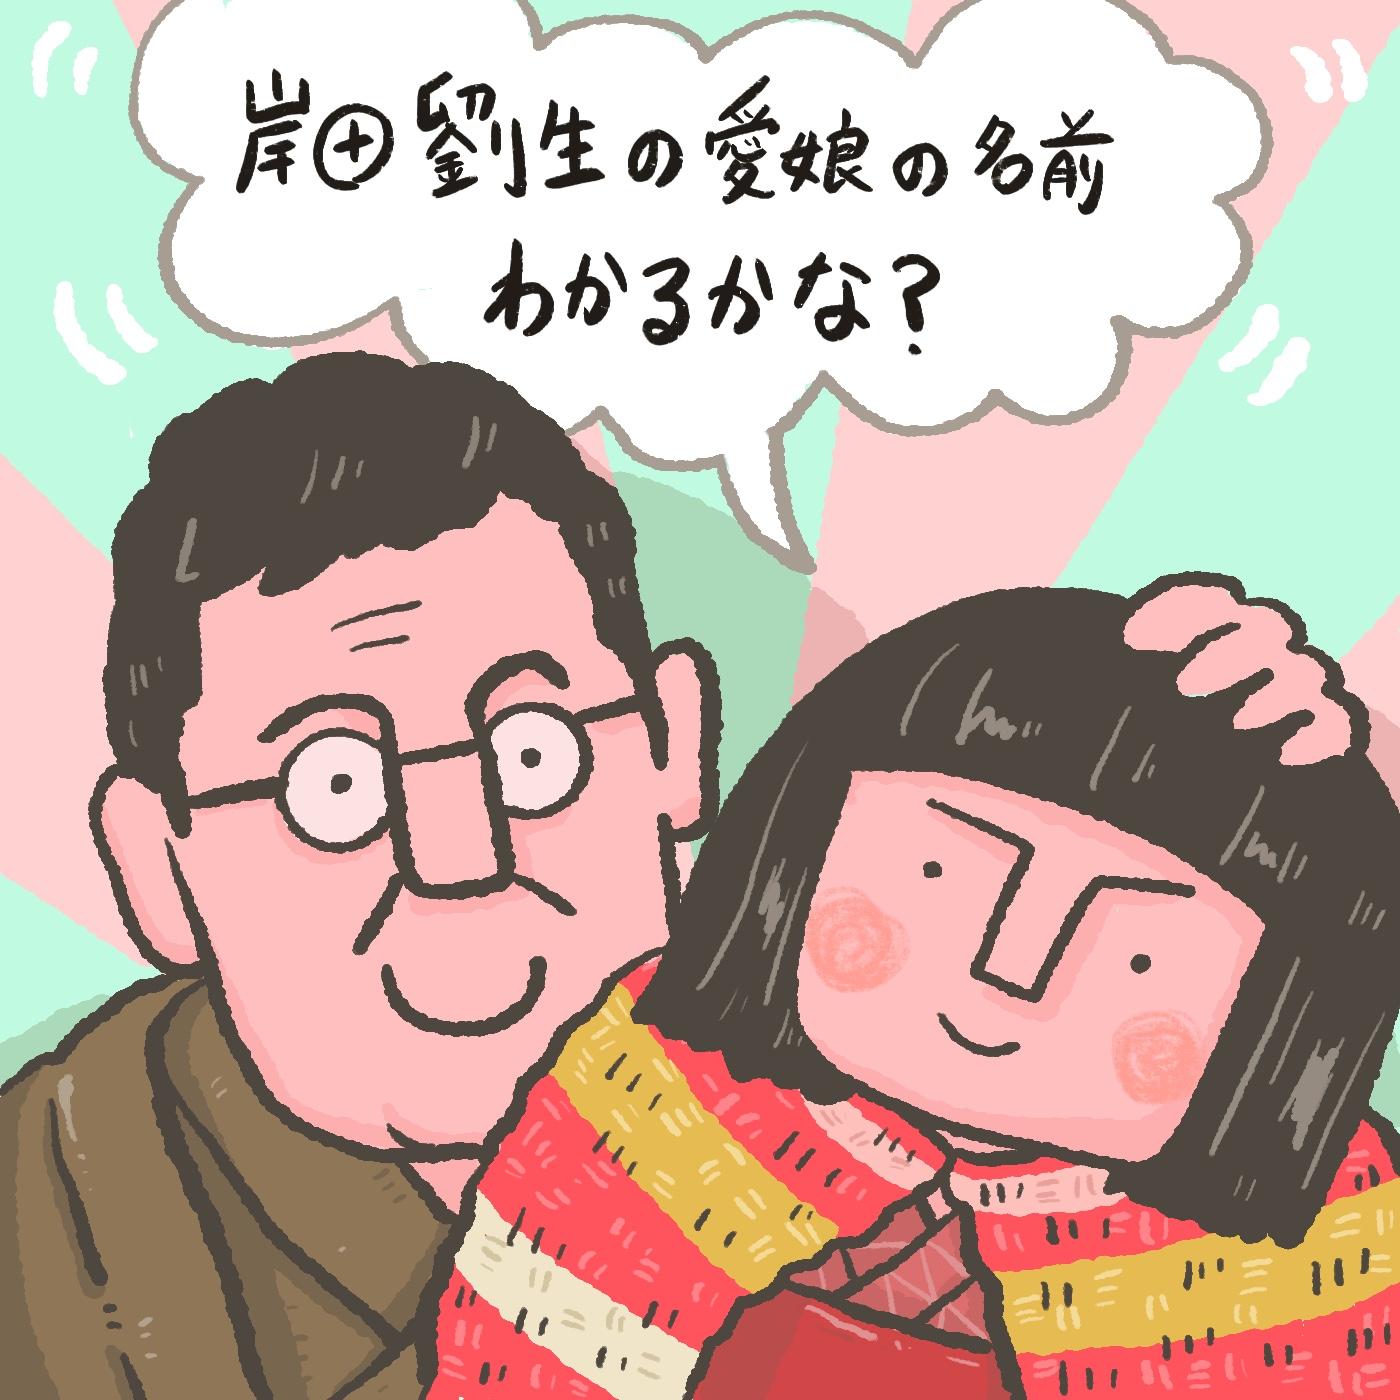 OBIKAKE ナニソレ 岸田劉生 麗子